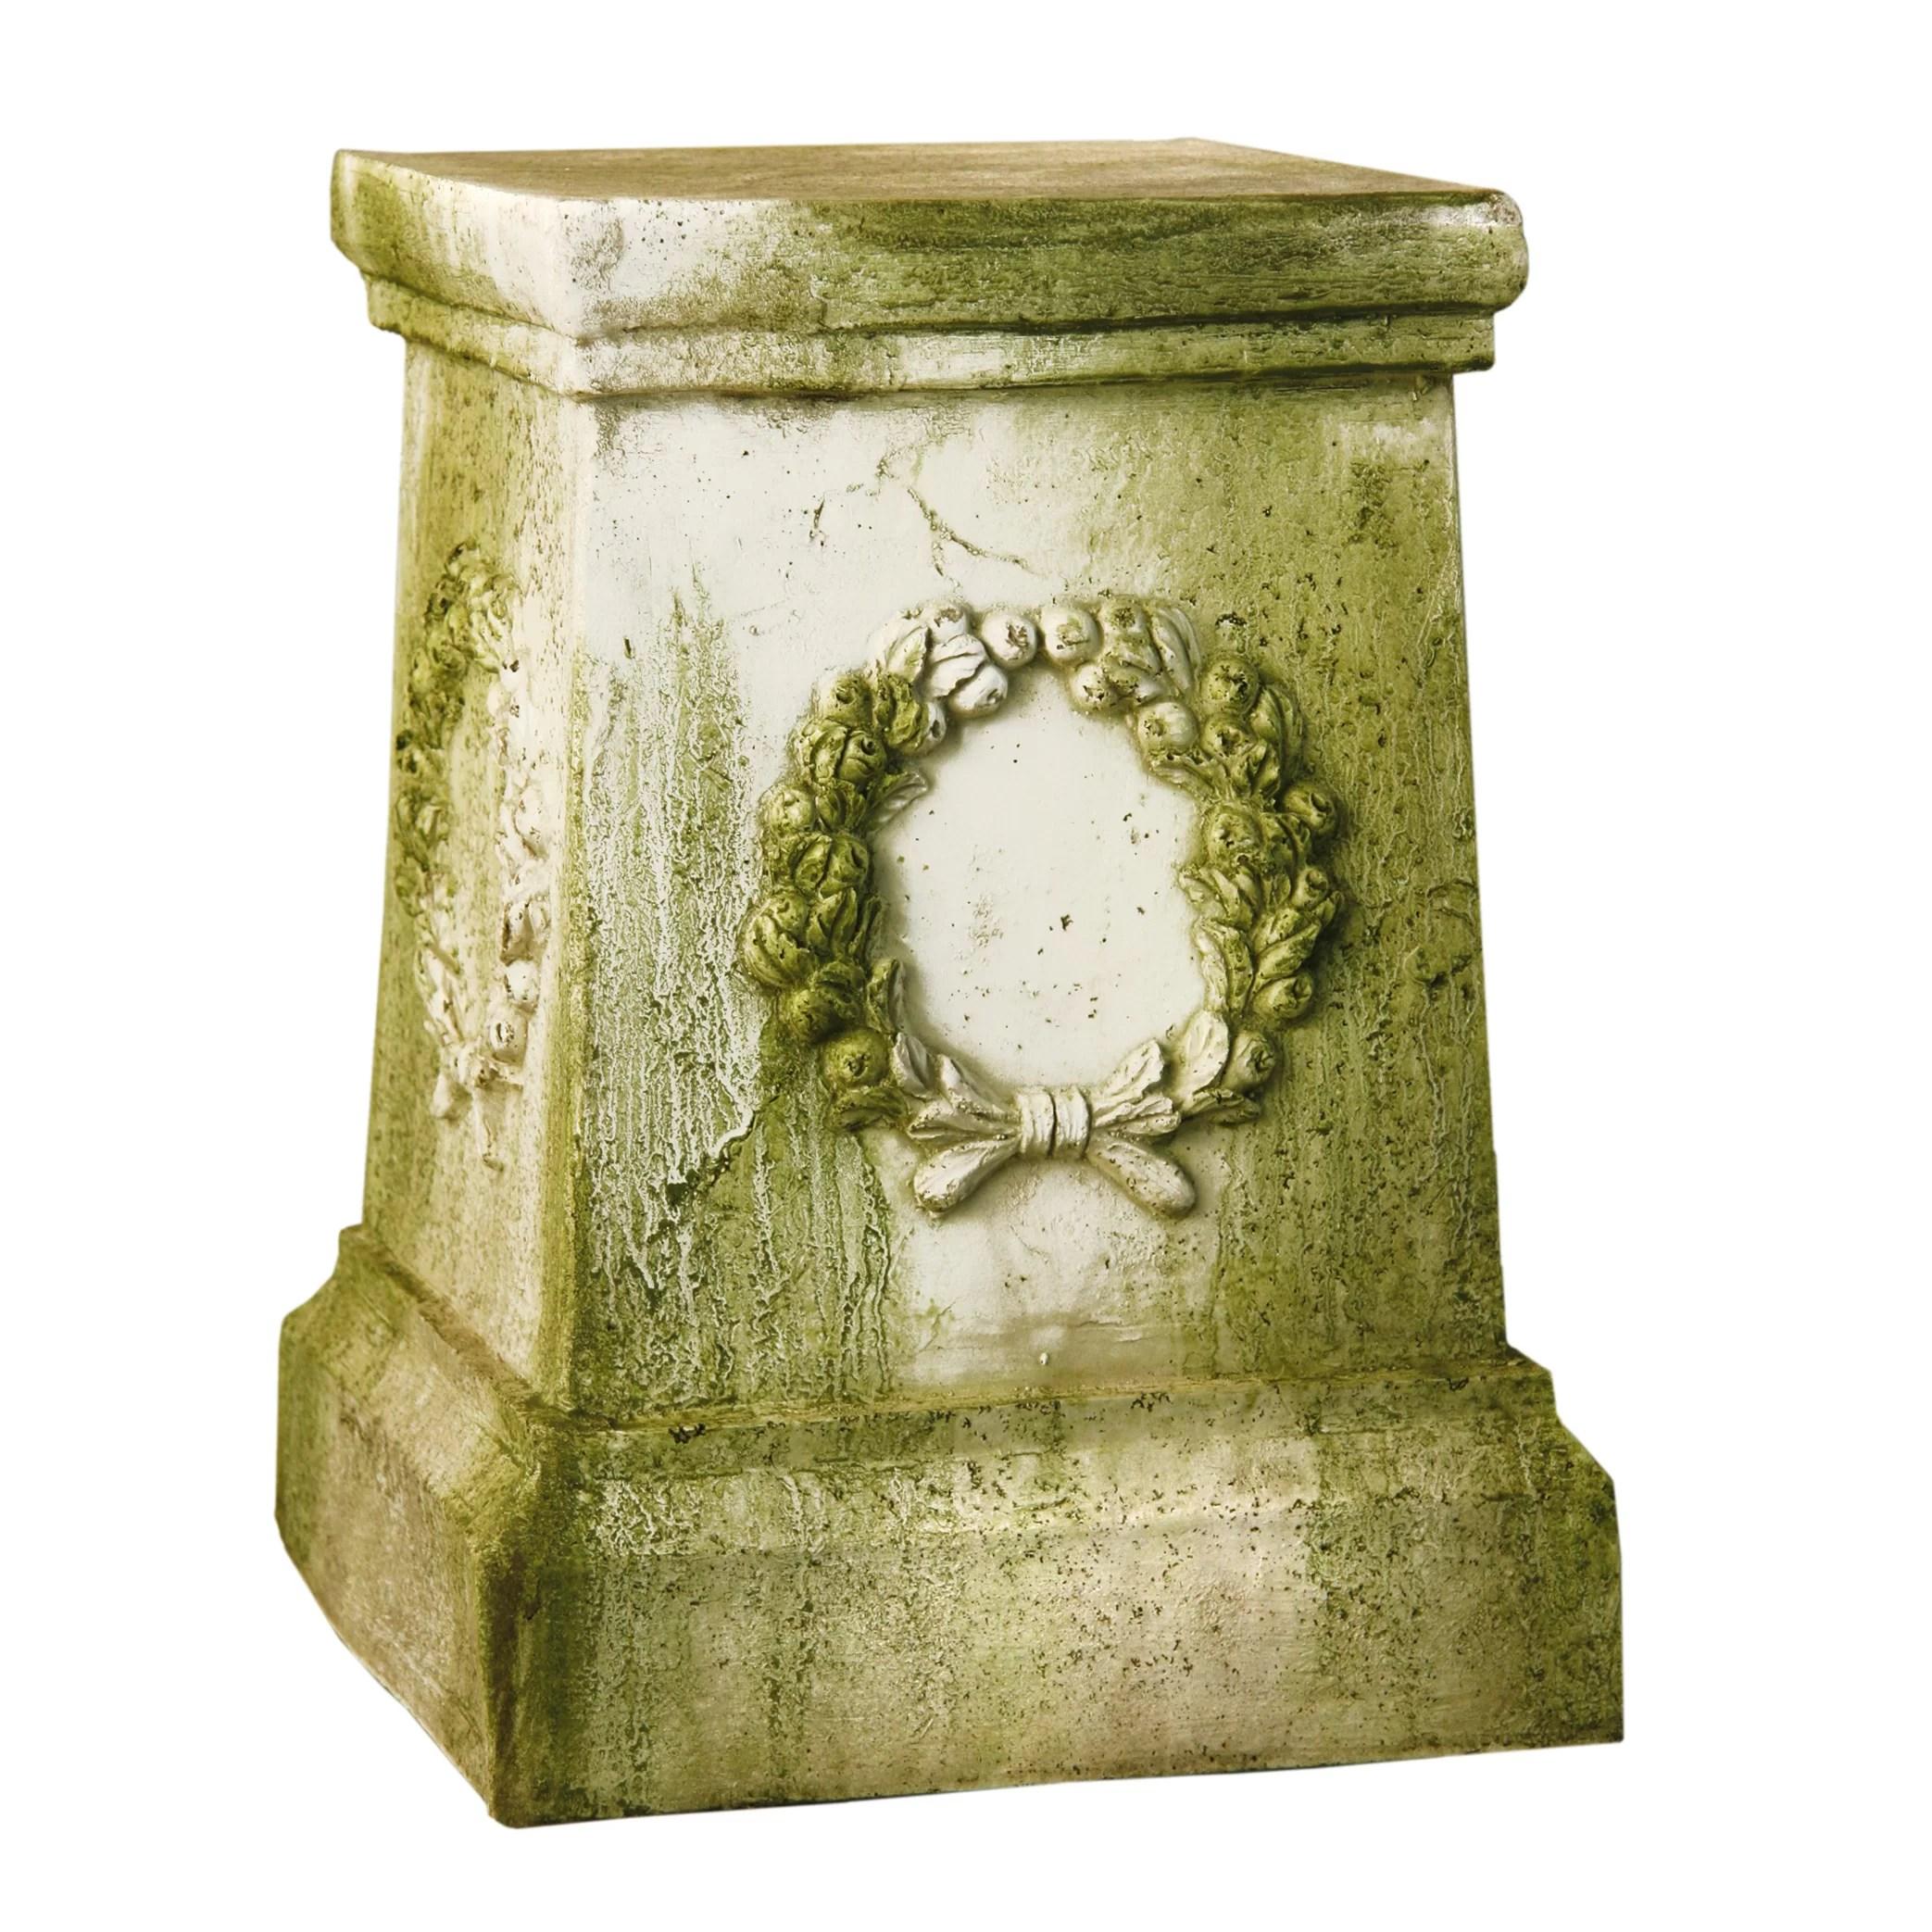 Orlandistatuary Wreath Outdoor Pedestal Amp Reviews